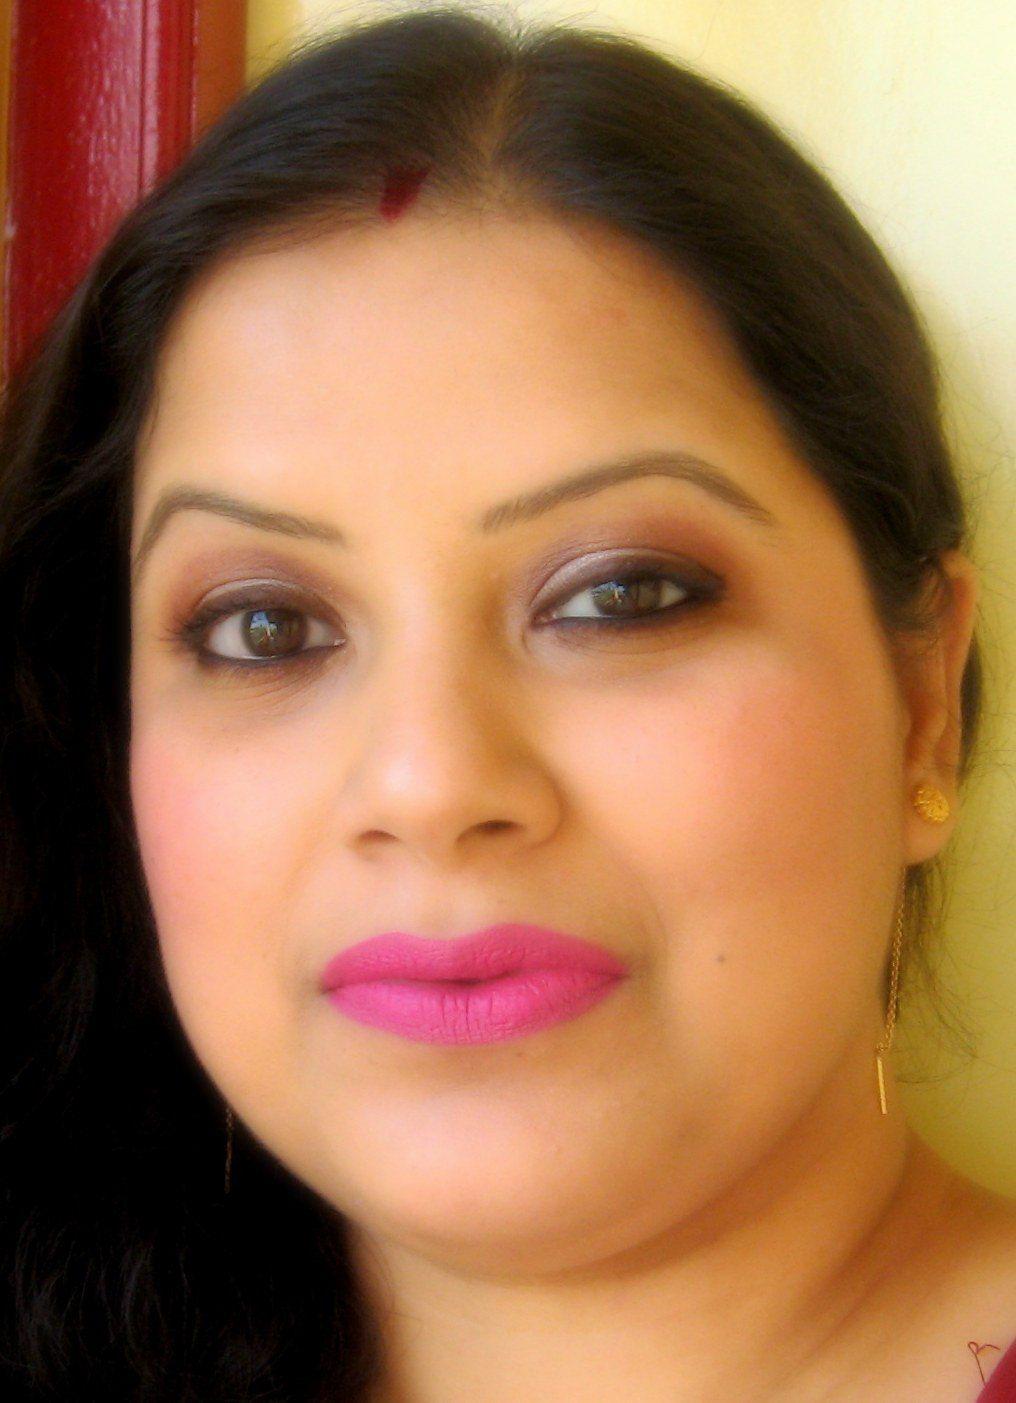 Nars lipstick - Schiap   Nars lipstick, Lipstick, Buy lipstick